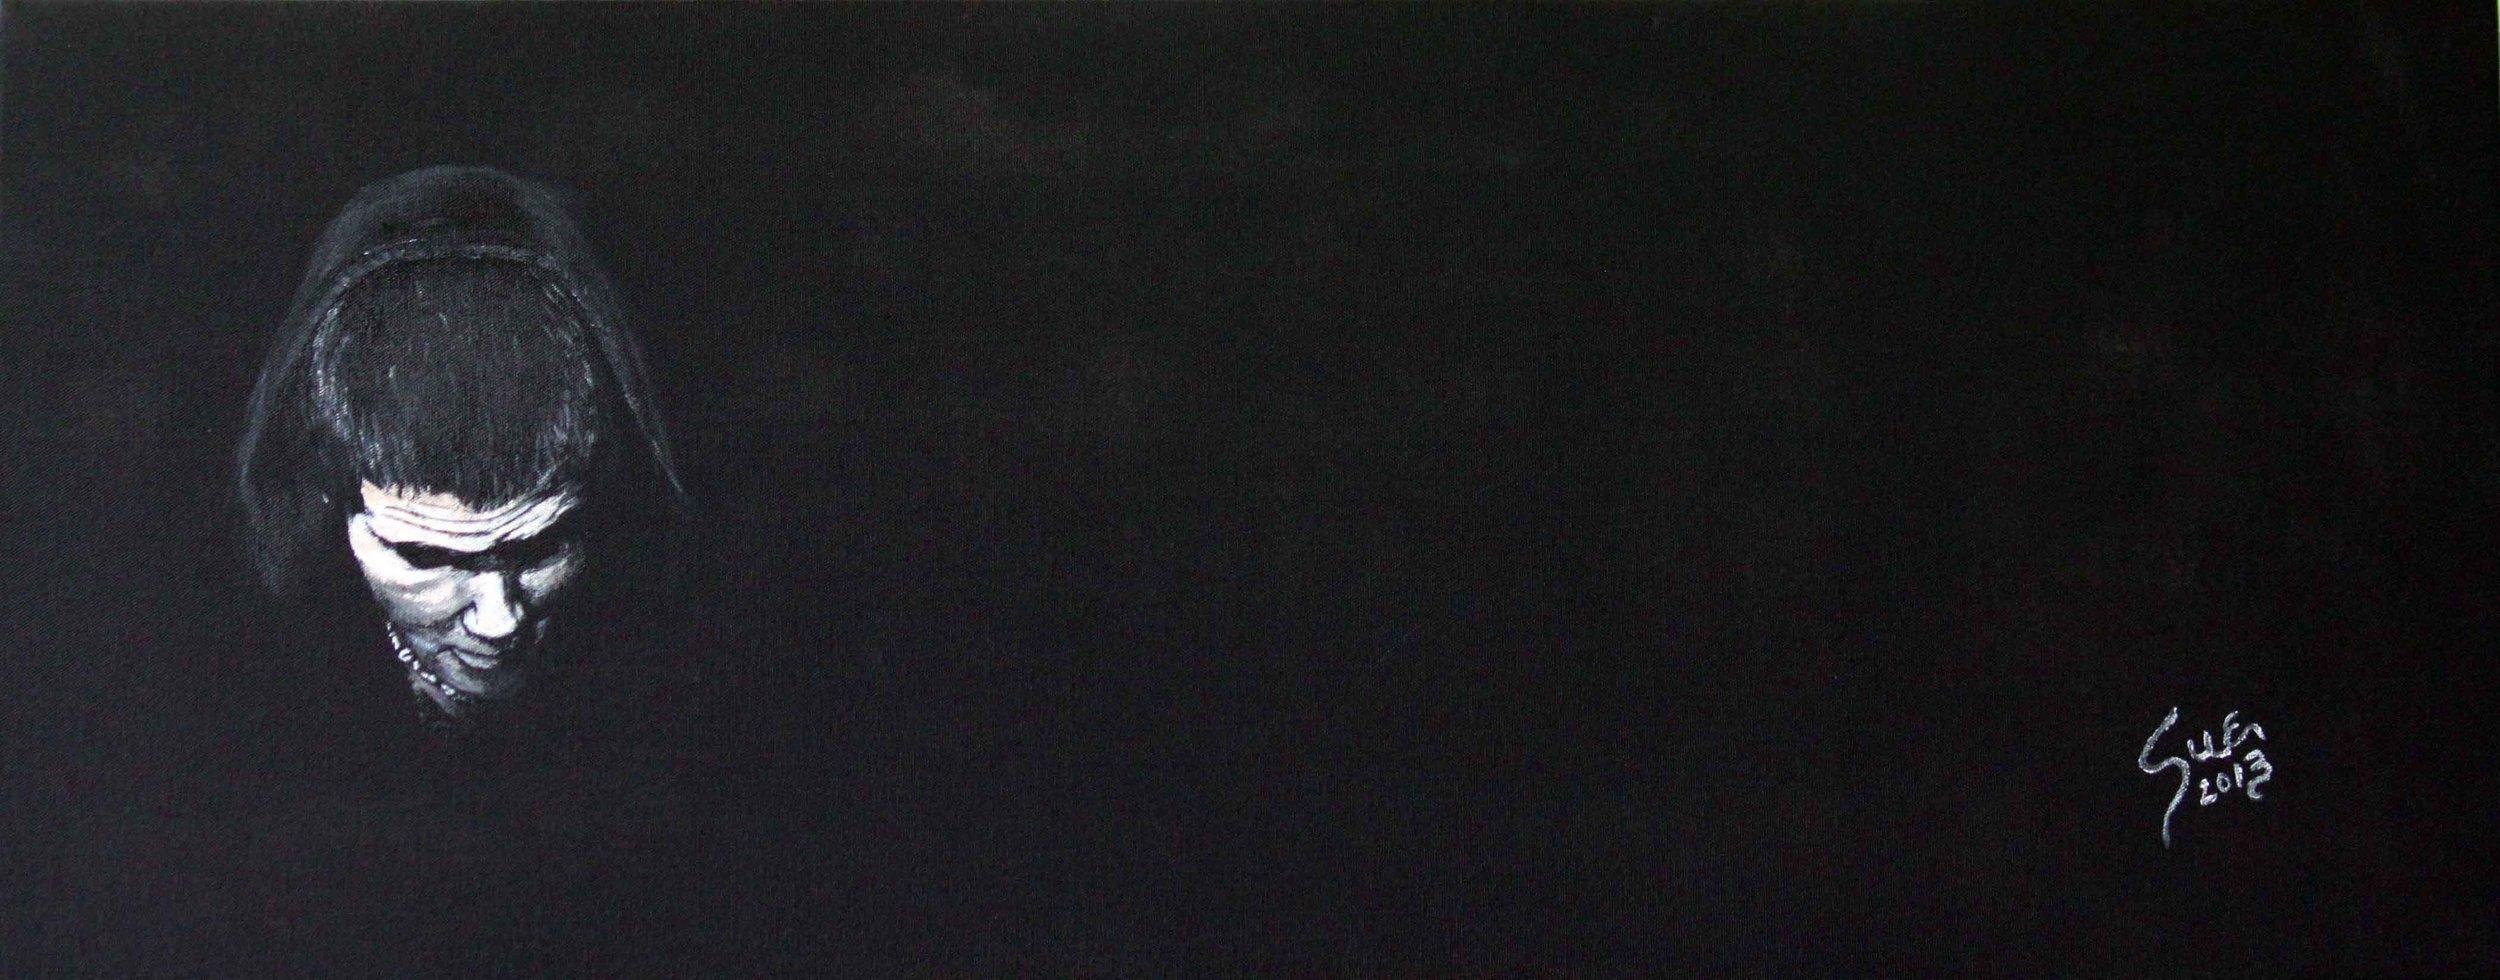 Sean-Dark Night